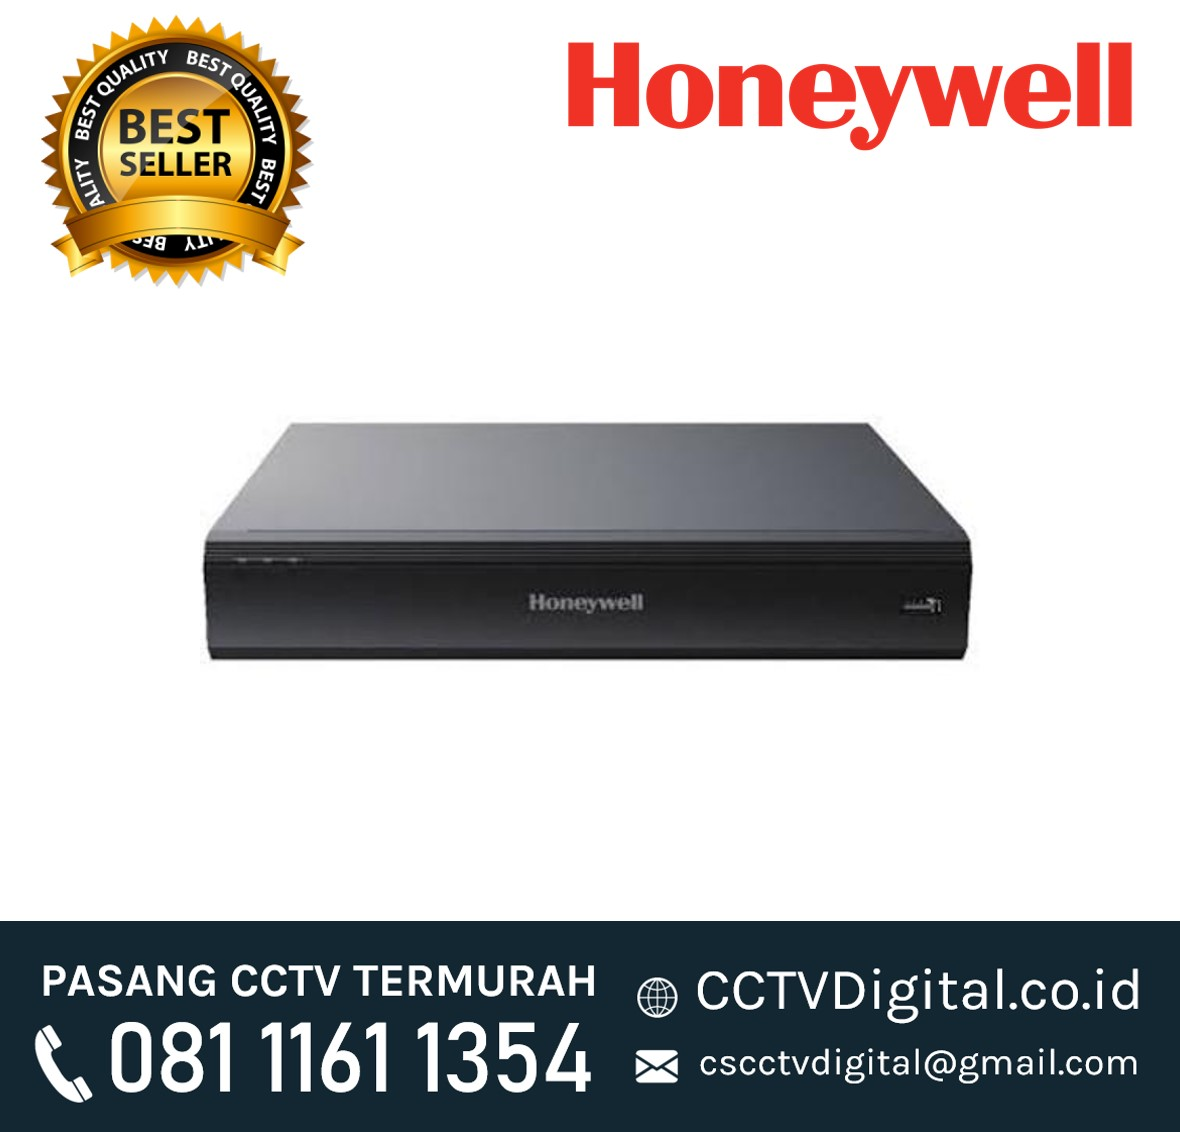 Jual Kamera CCTV Merk Honeywell Paket Lengkap